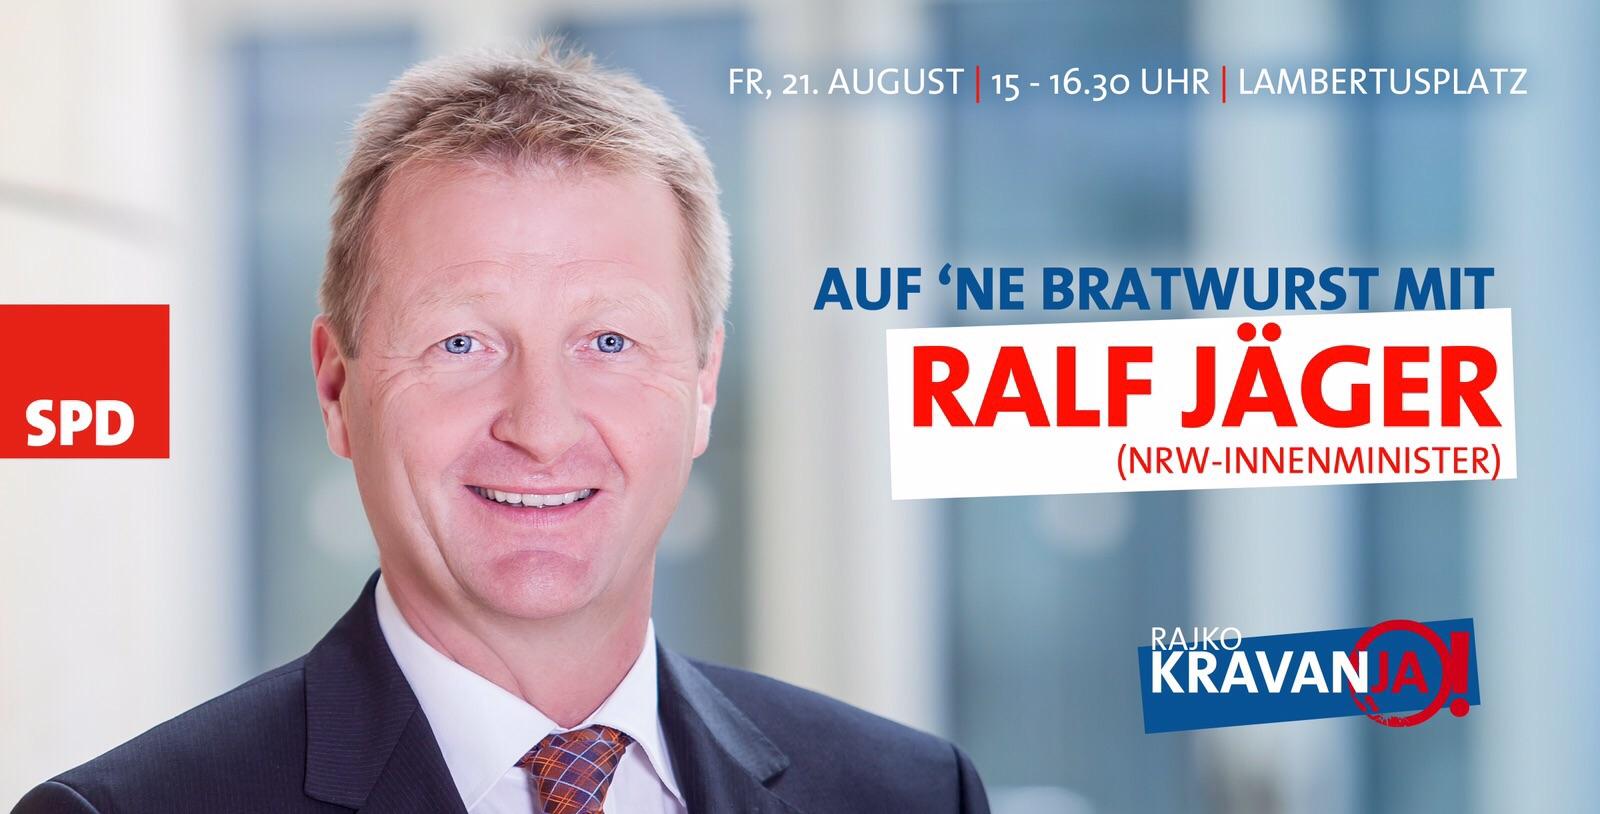 Speeddating mit Ralf Jäger